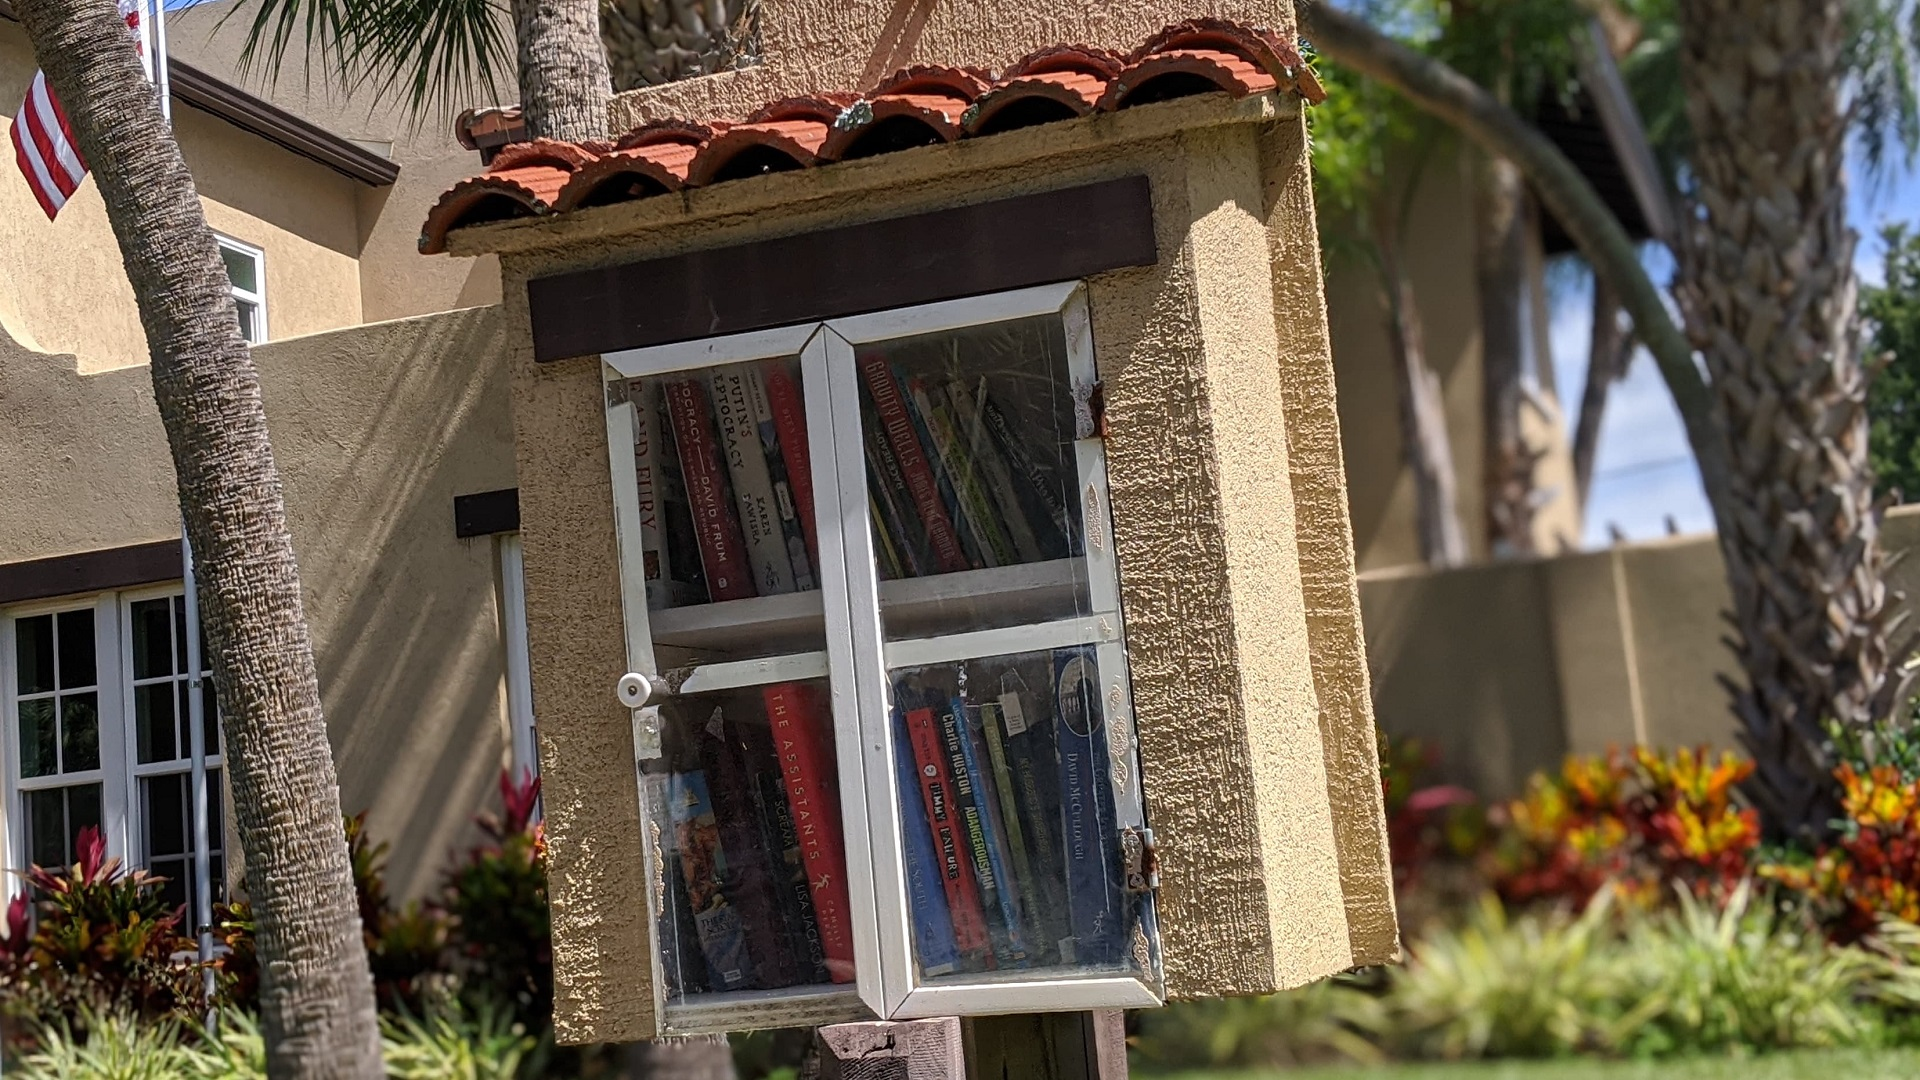 Small Library HONNA